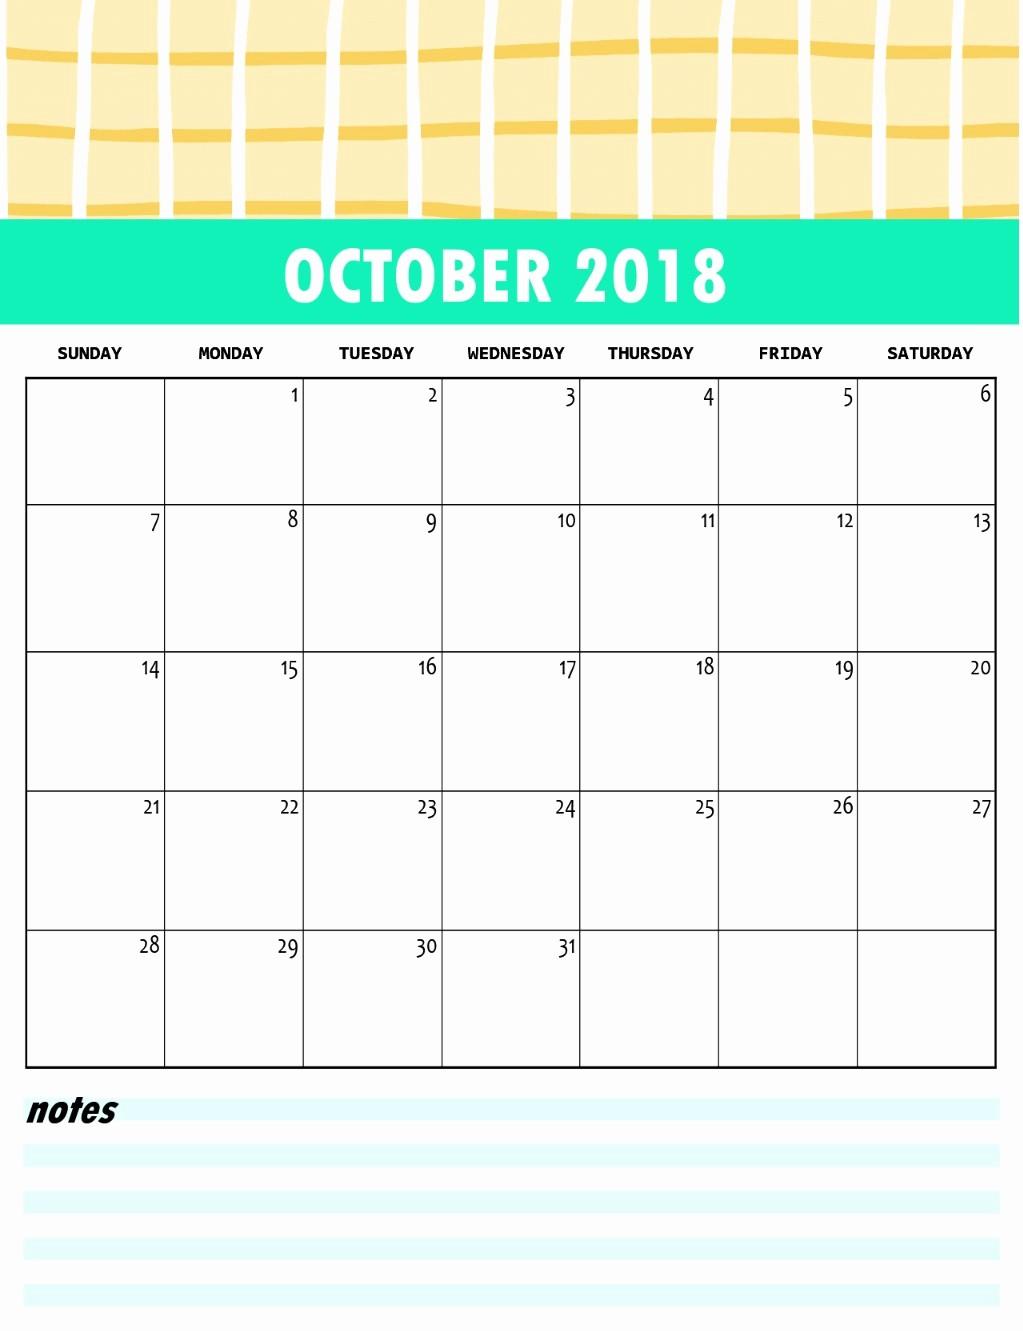 October 2018 Printable Calendar Word Fresh Download Pdf Excel Word Calendar October 2018